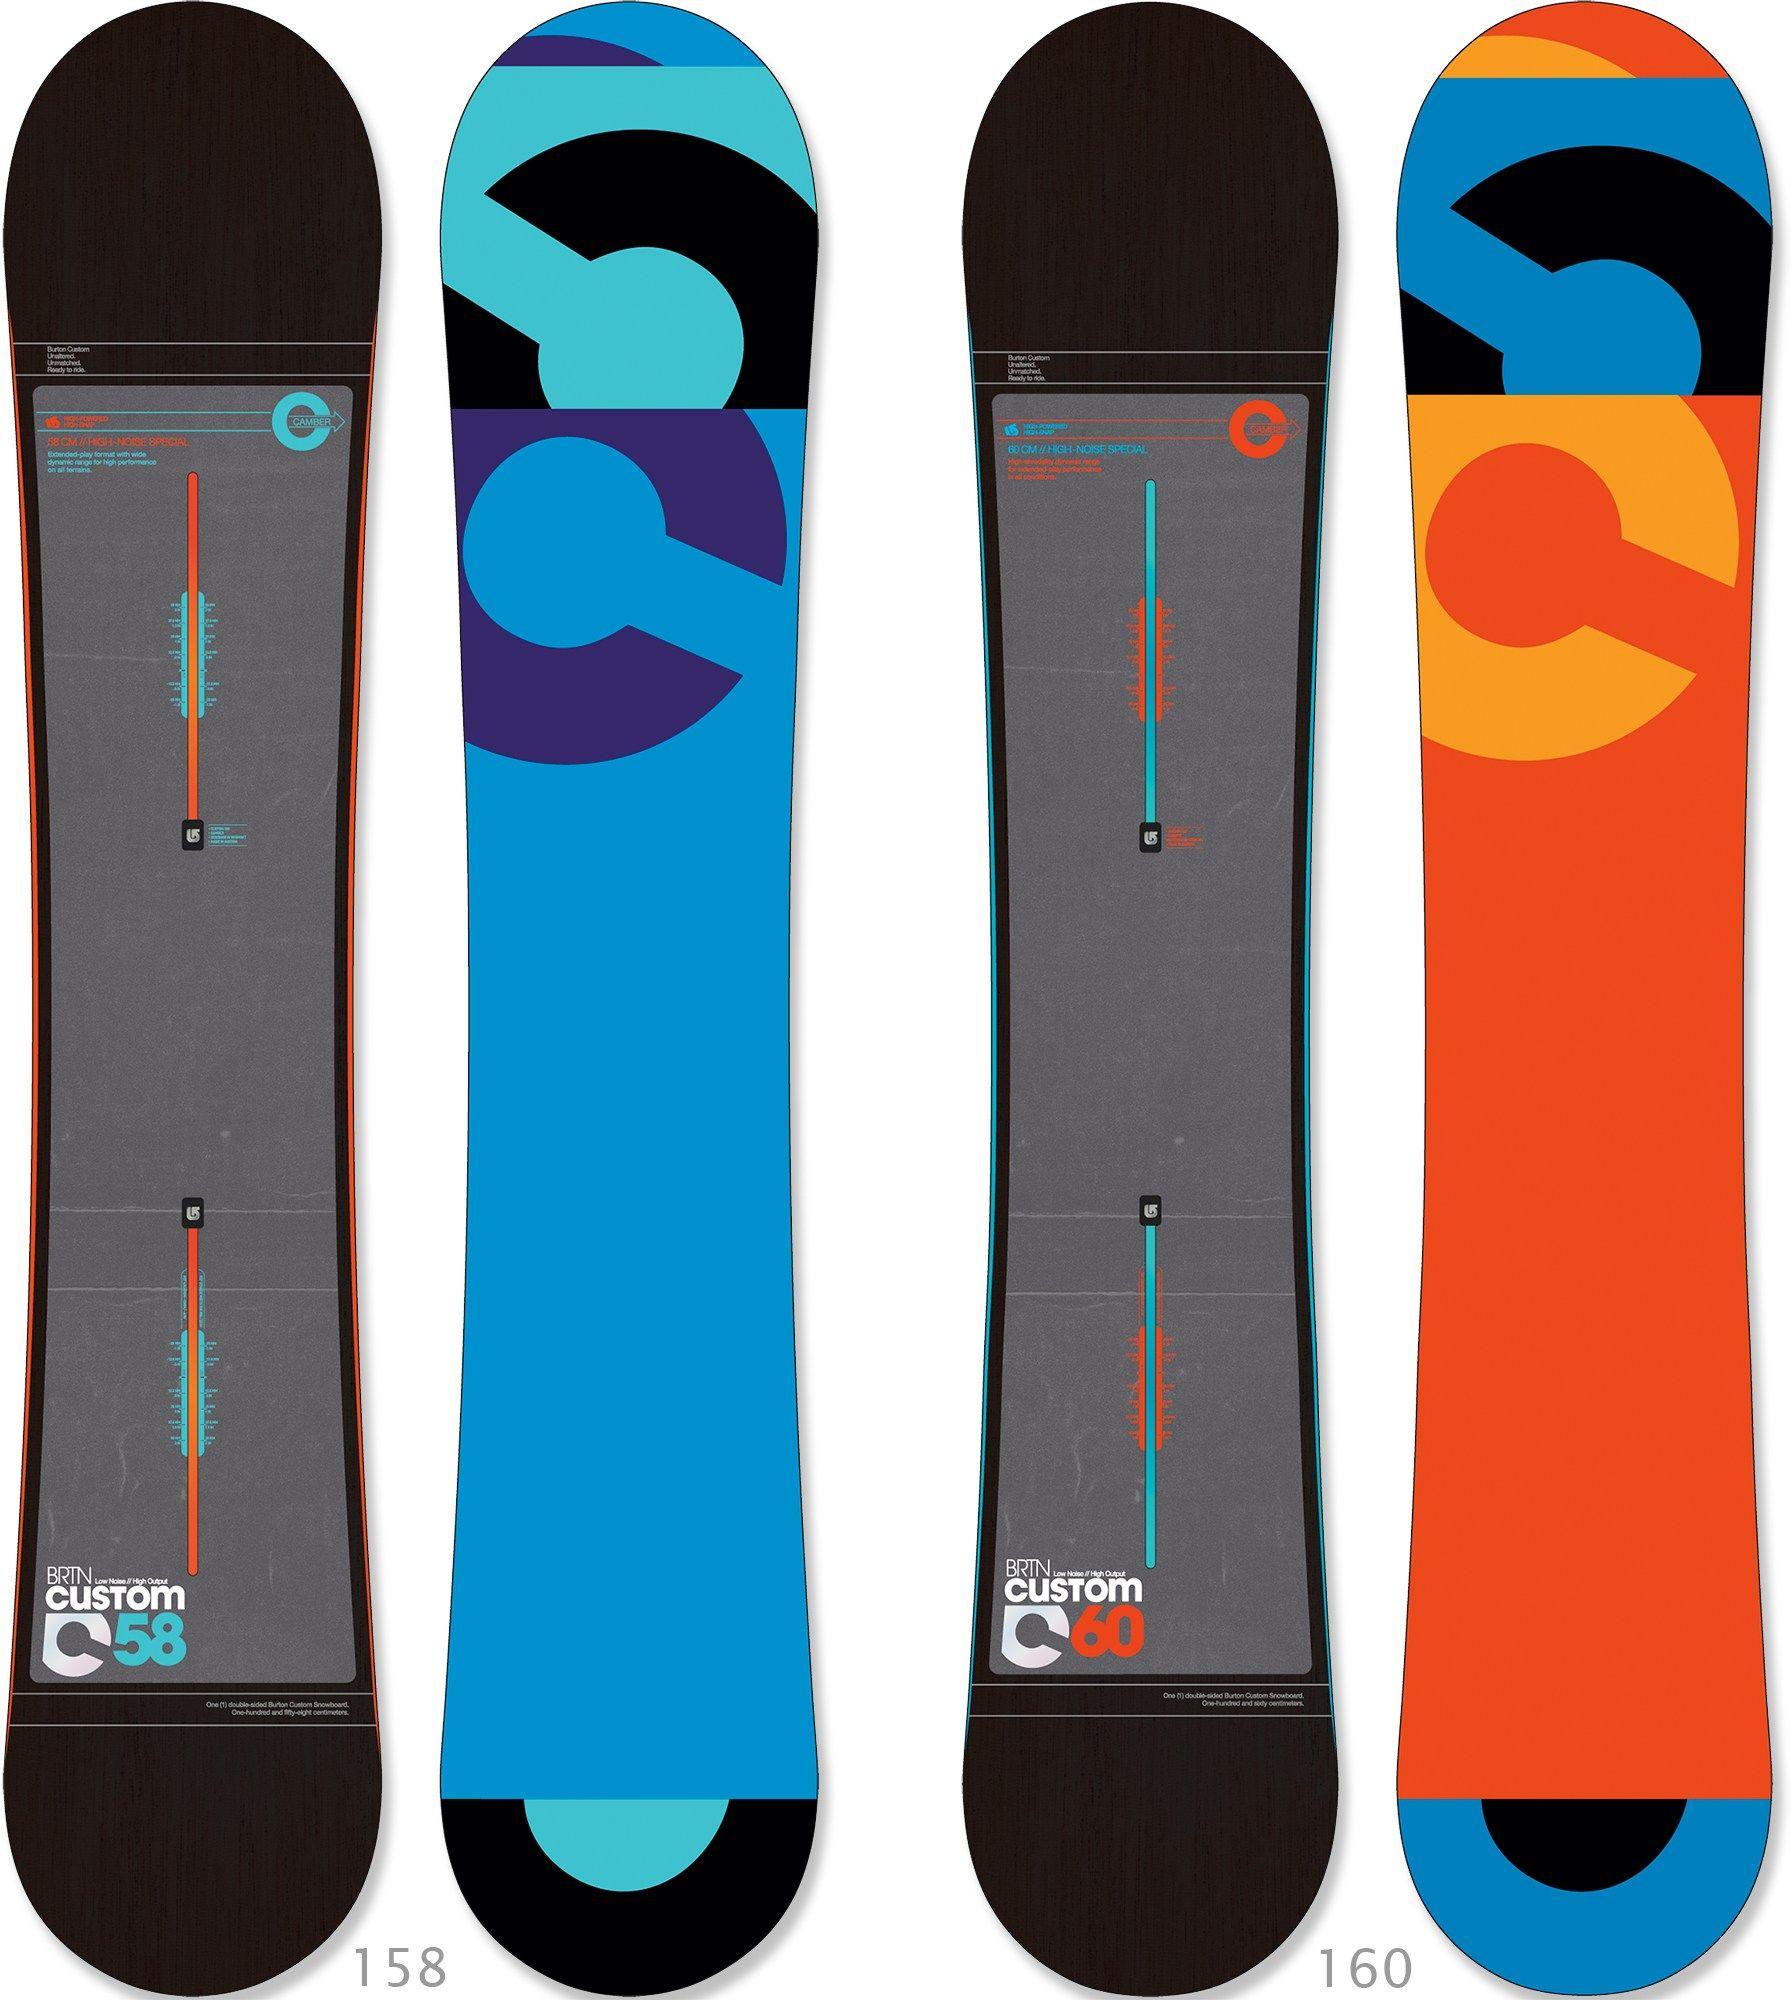 51a2ad15ad0a Burton Custom Snowboard - 2012 2013 at REI.com